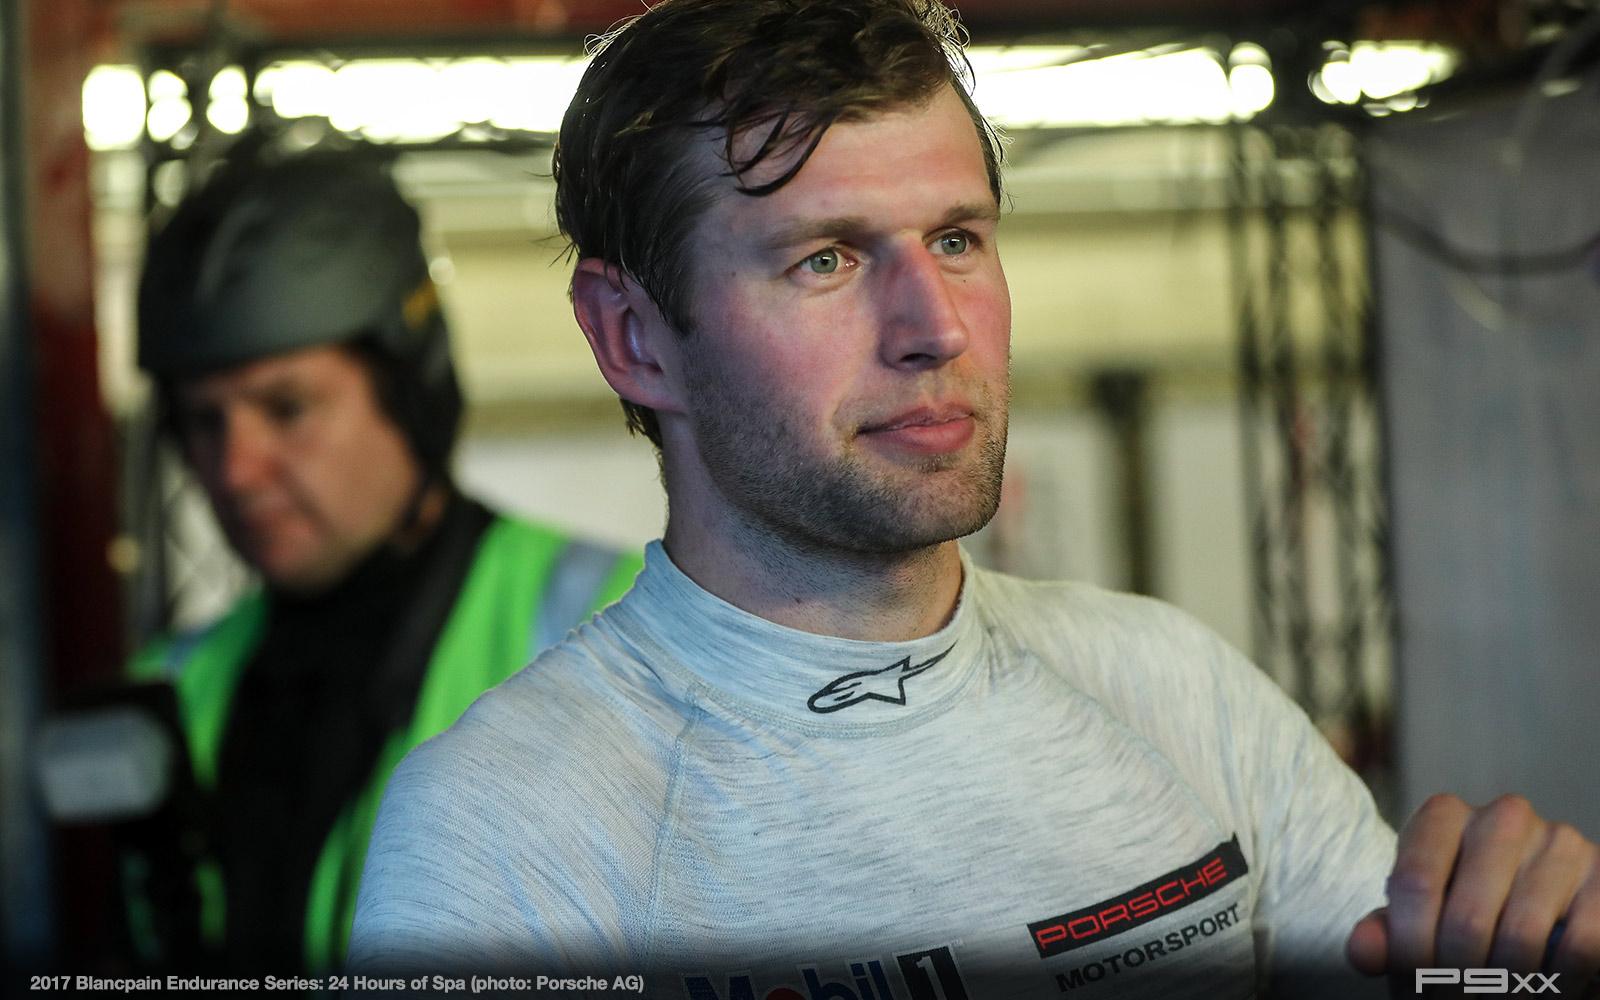 2017-24-Hours-of-Spa-Porsche-373